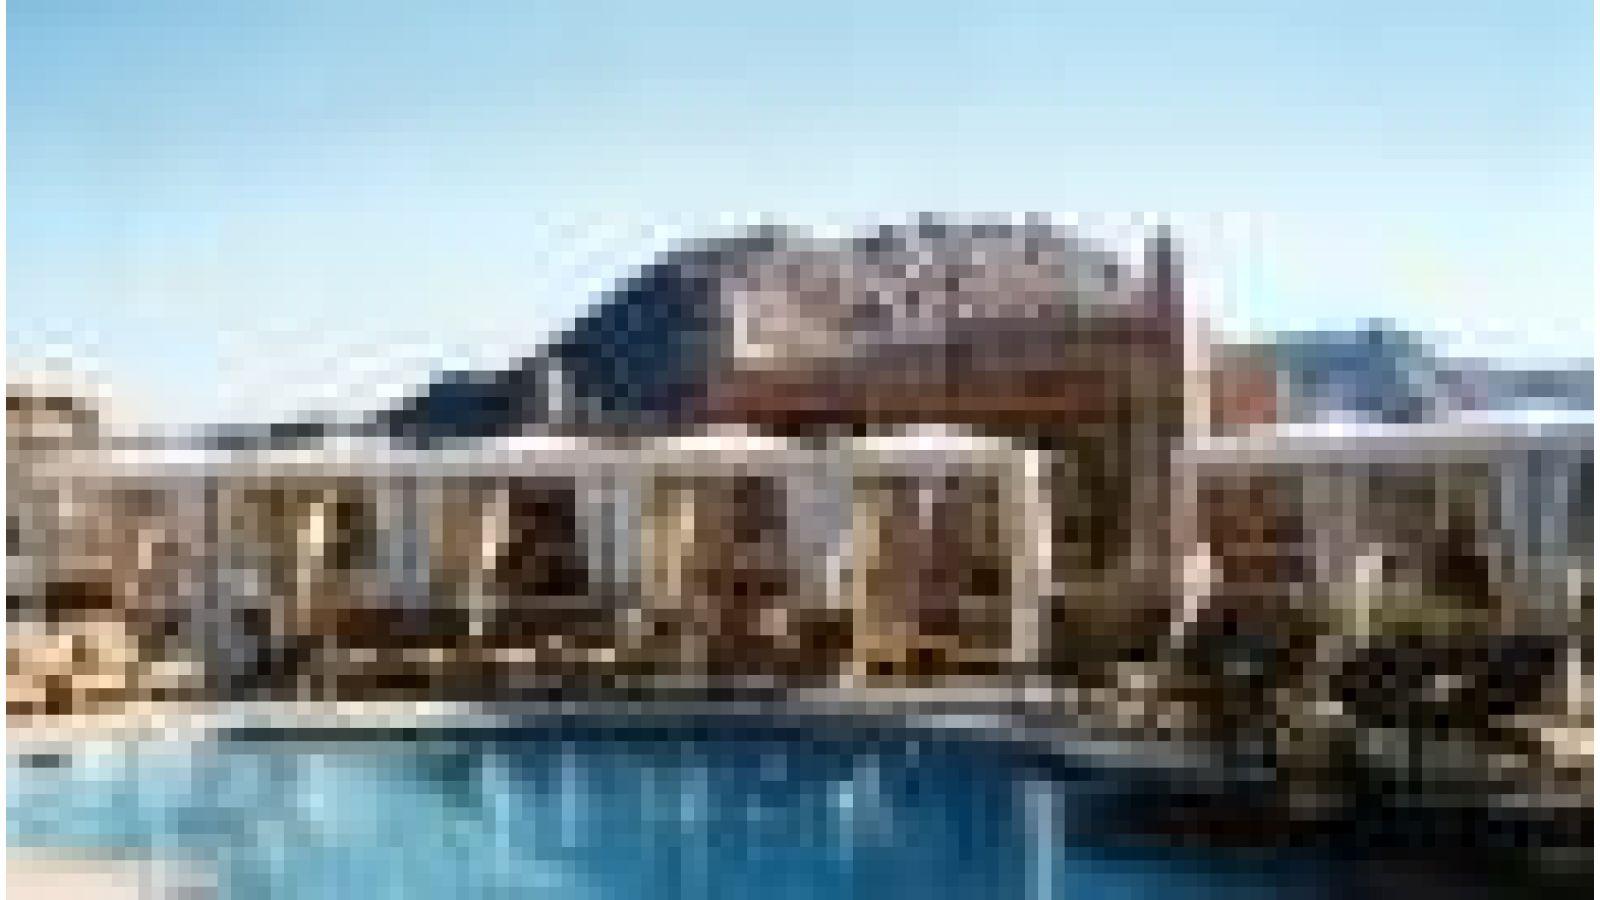 Resort cabanas